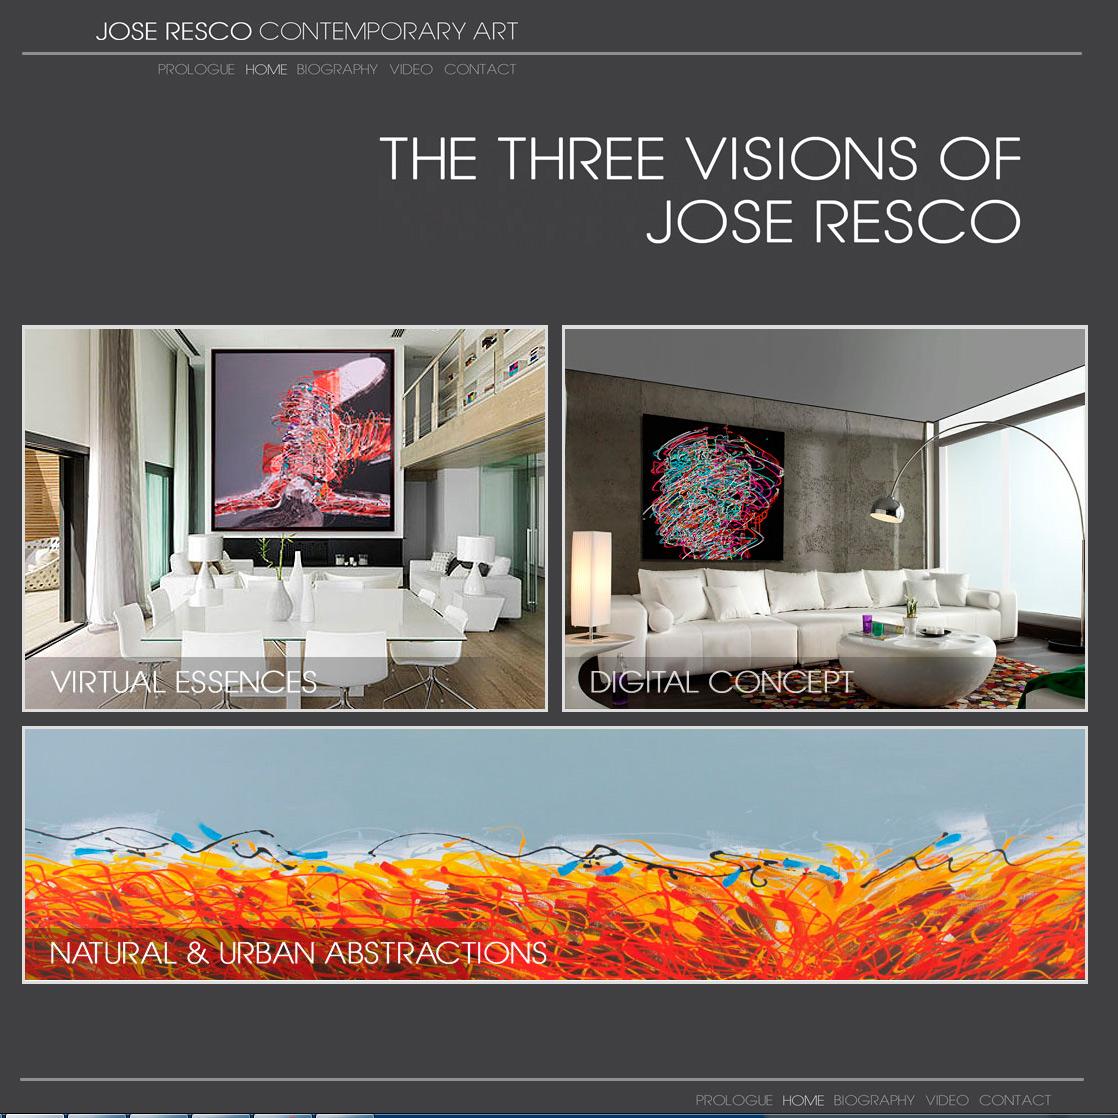 Jose Resco